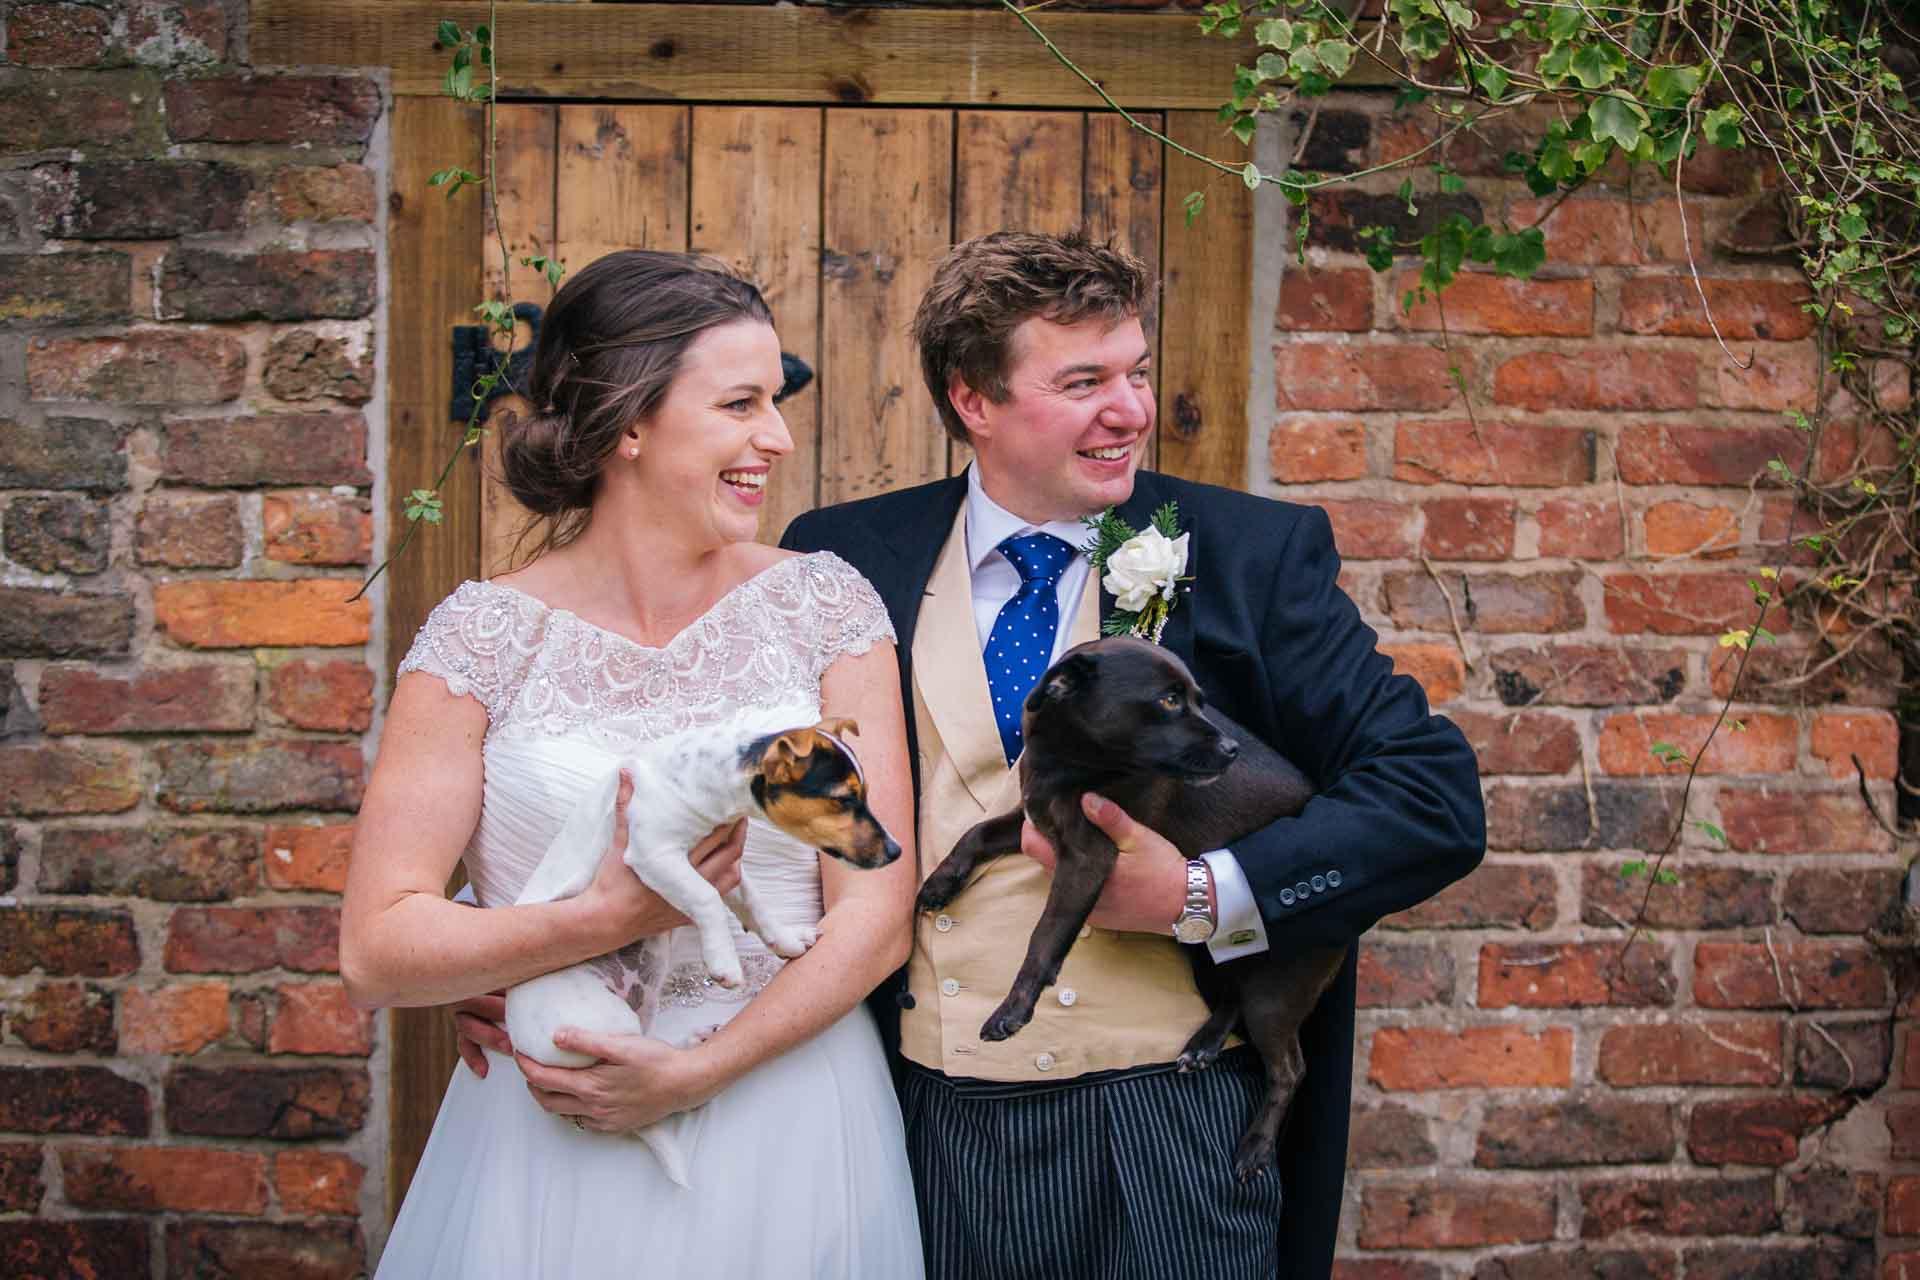 Richard & Caroline's Wedding Country Marquee Wedding, Cheshire